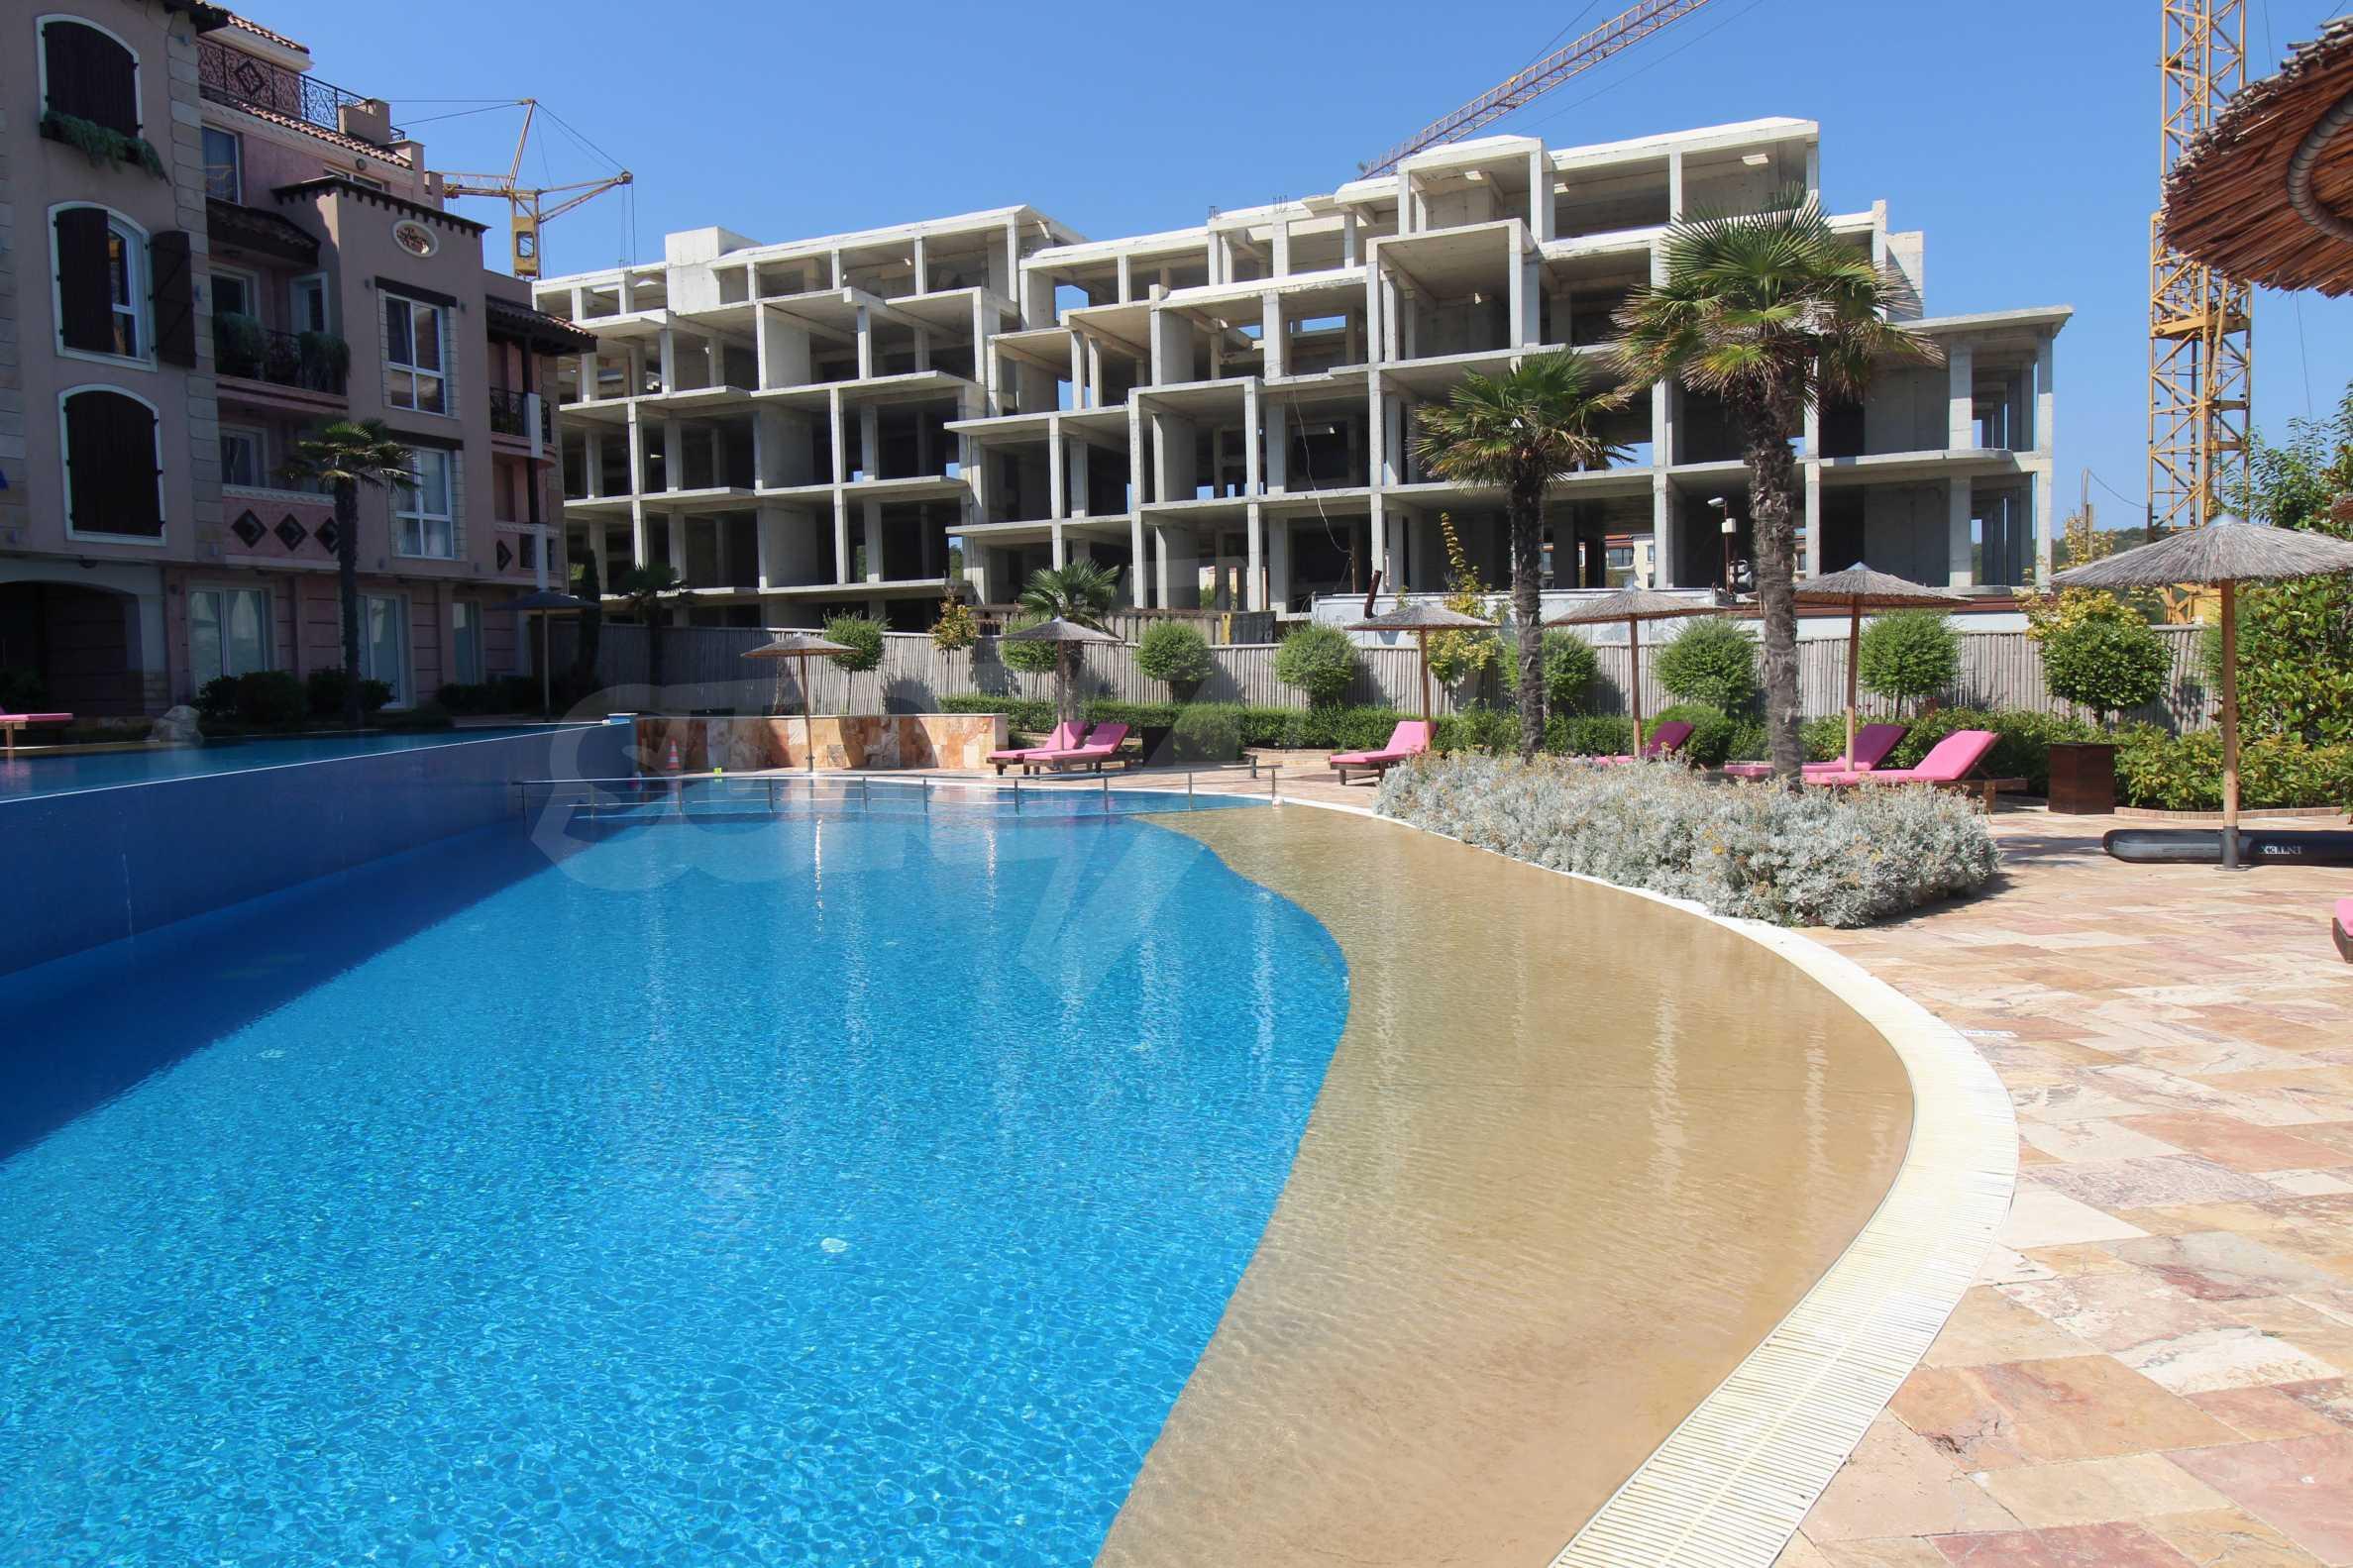 New 1-bedroom apartment in a coastal complex by the Kavatsite Beach (Sozopol) 19